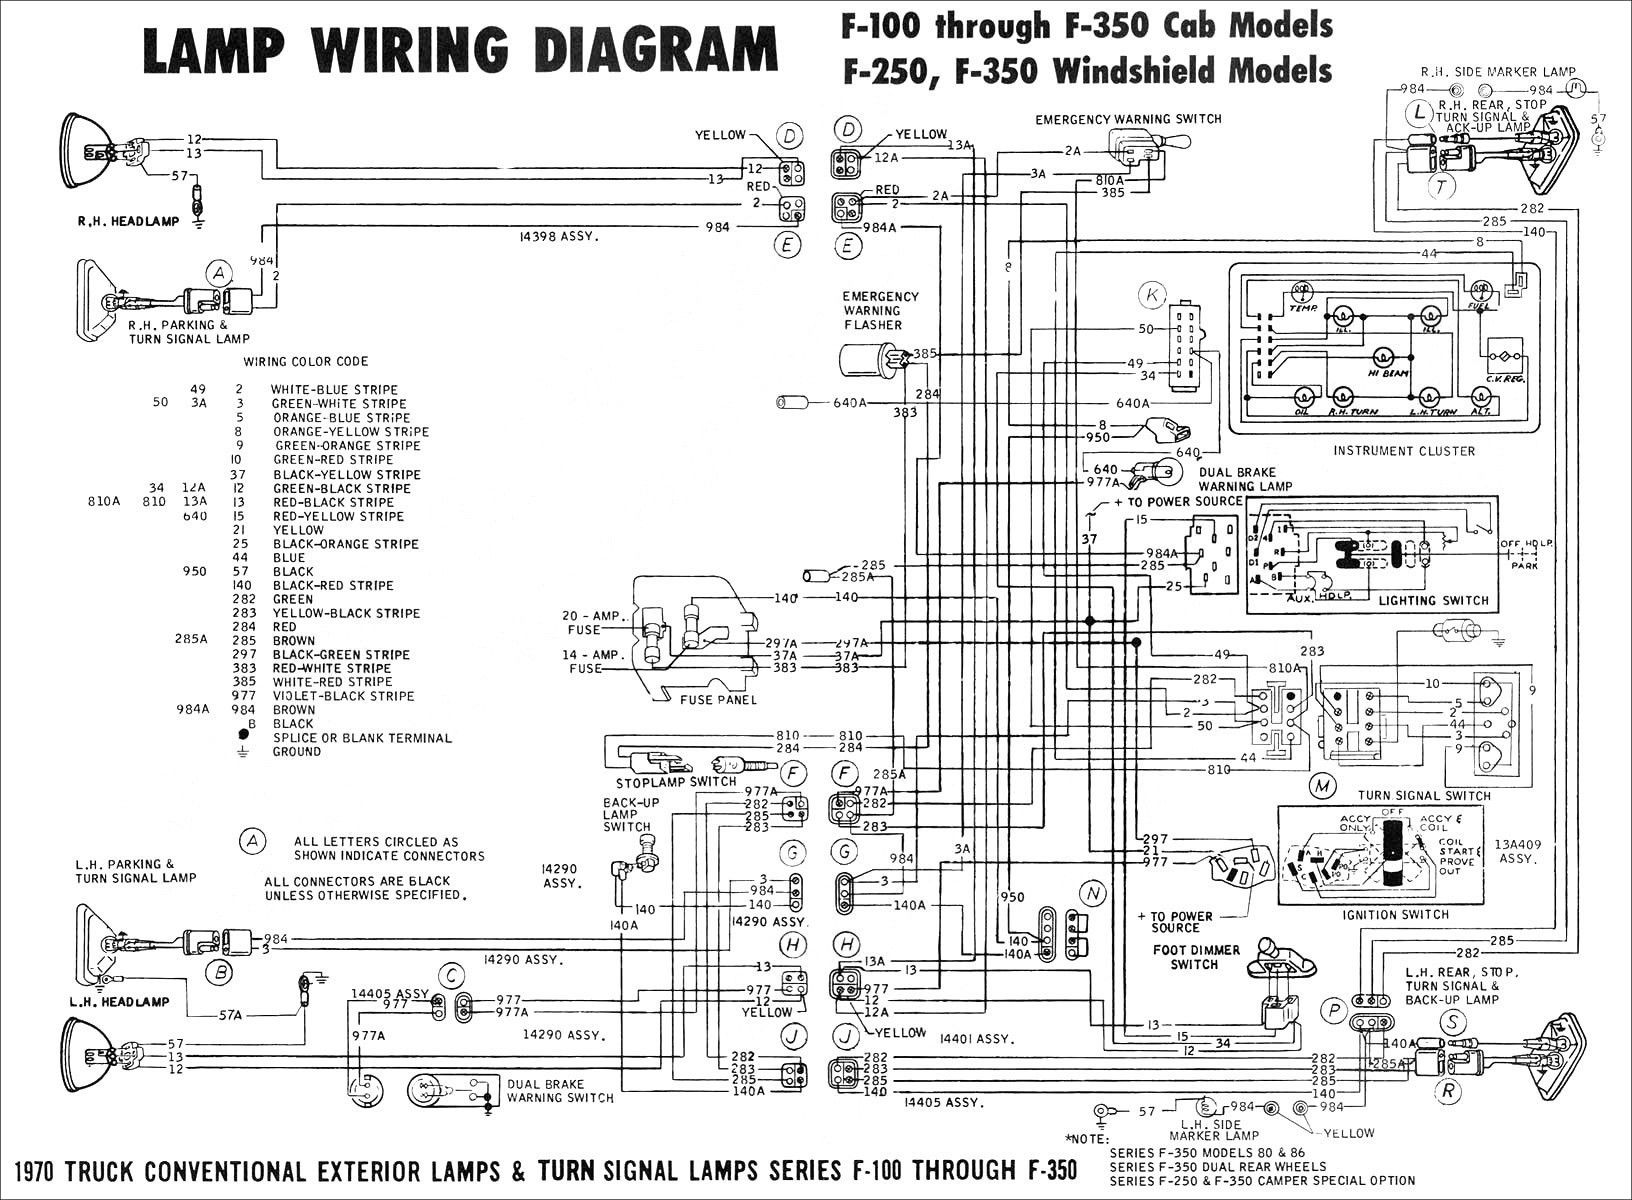 New 1997 Jeep Grand Cherokee Laredo Wiring Diagram Download Trailer Wiring Diagram Electrical Wiring Diagram Circuit Diagram